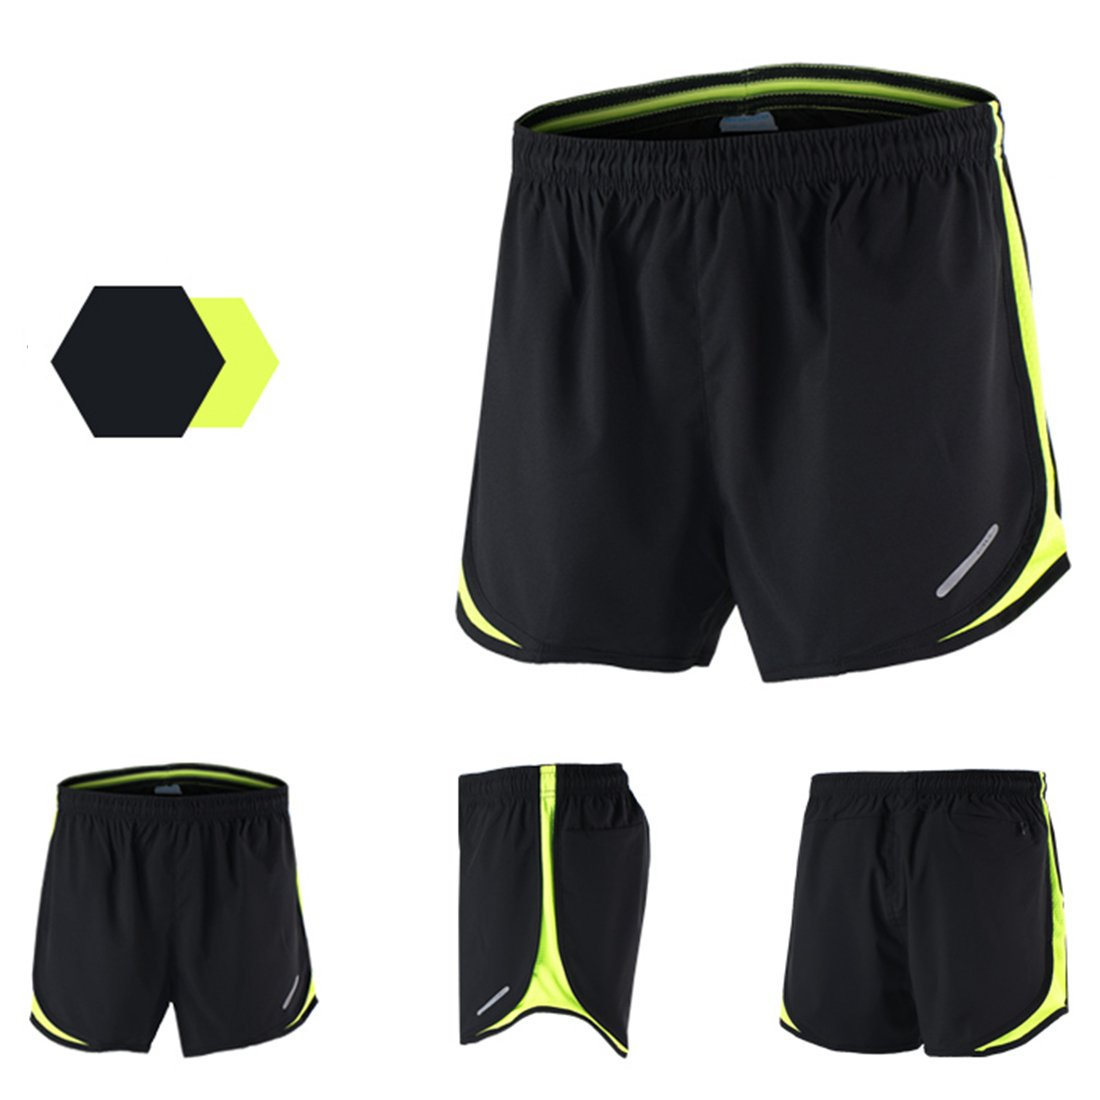 X-Labor Herren Sport Marathon Shorts Kurz Laufhose mit Innenslip Fitness Gym Yoga Laufshorts Trainingsshorts Sporthose